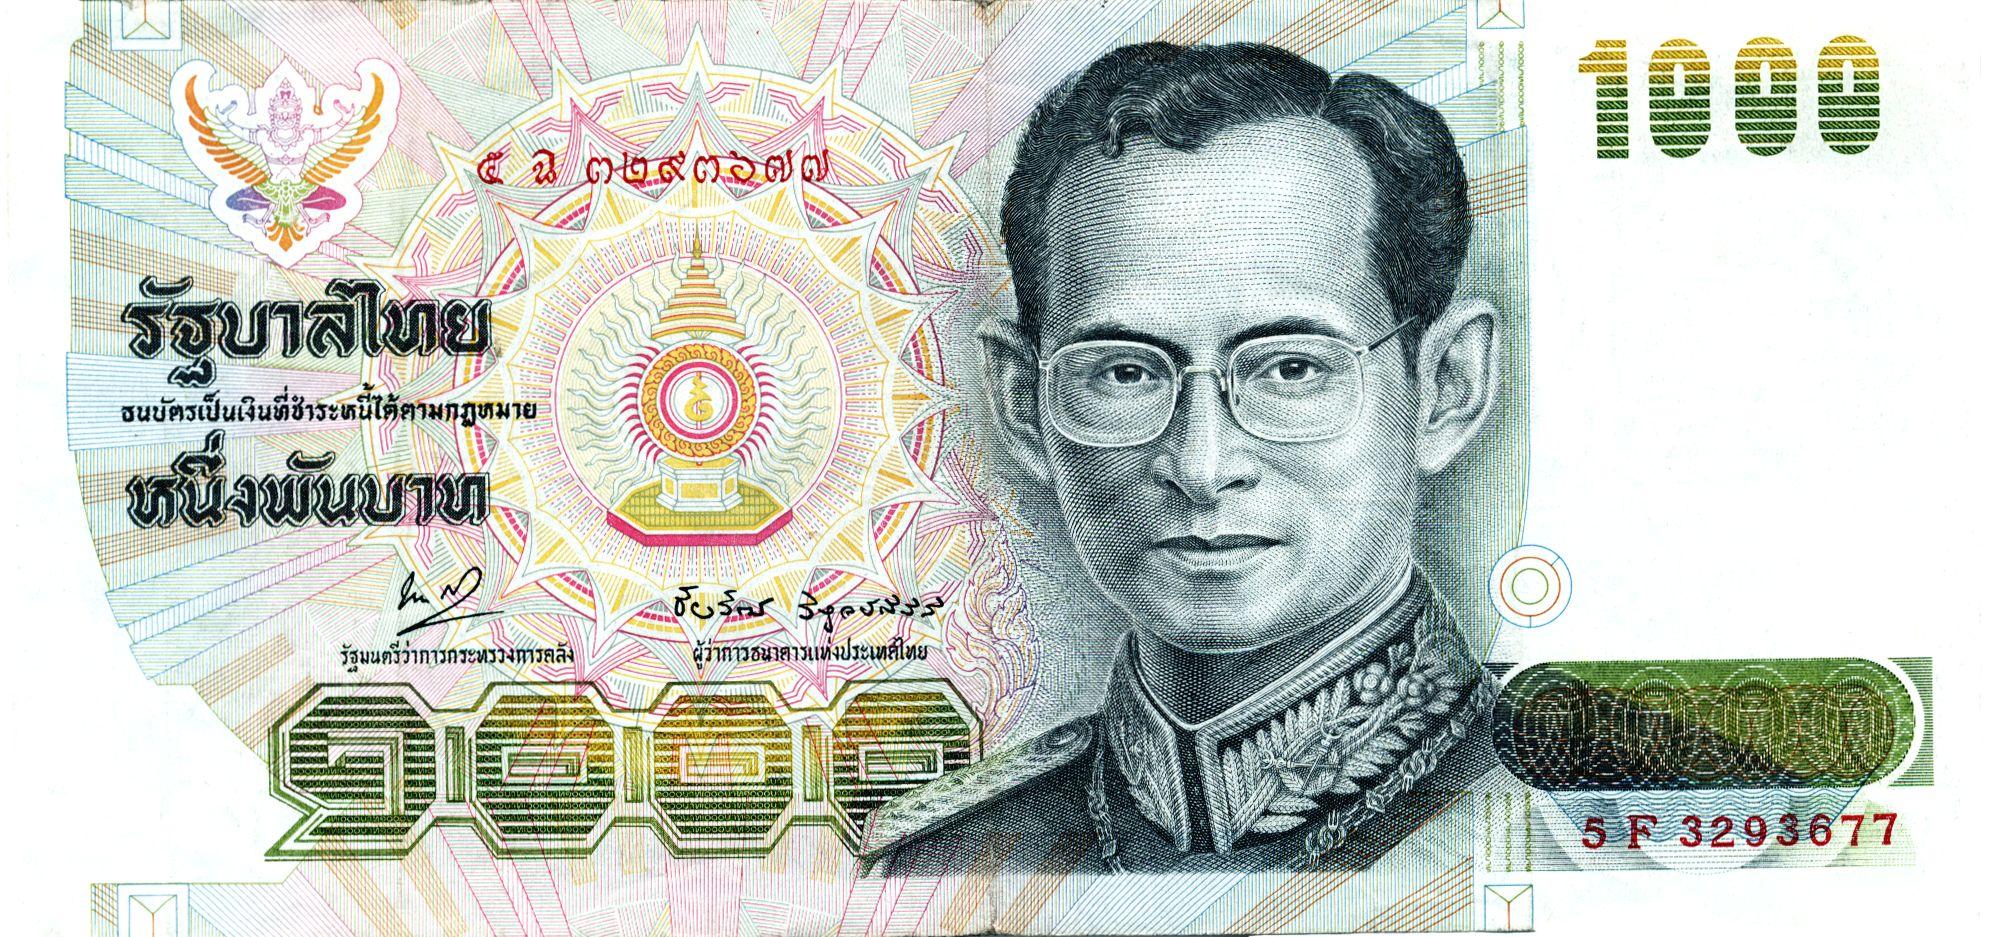 http://vvvspb.prodick.ru/country/bones/thailand/92_a.jpg